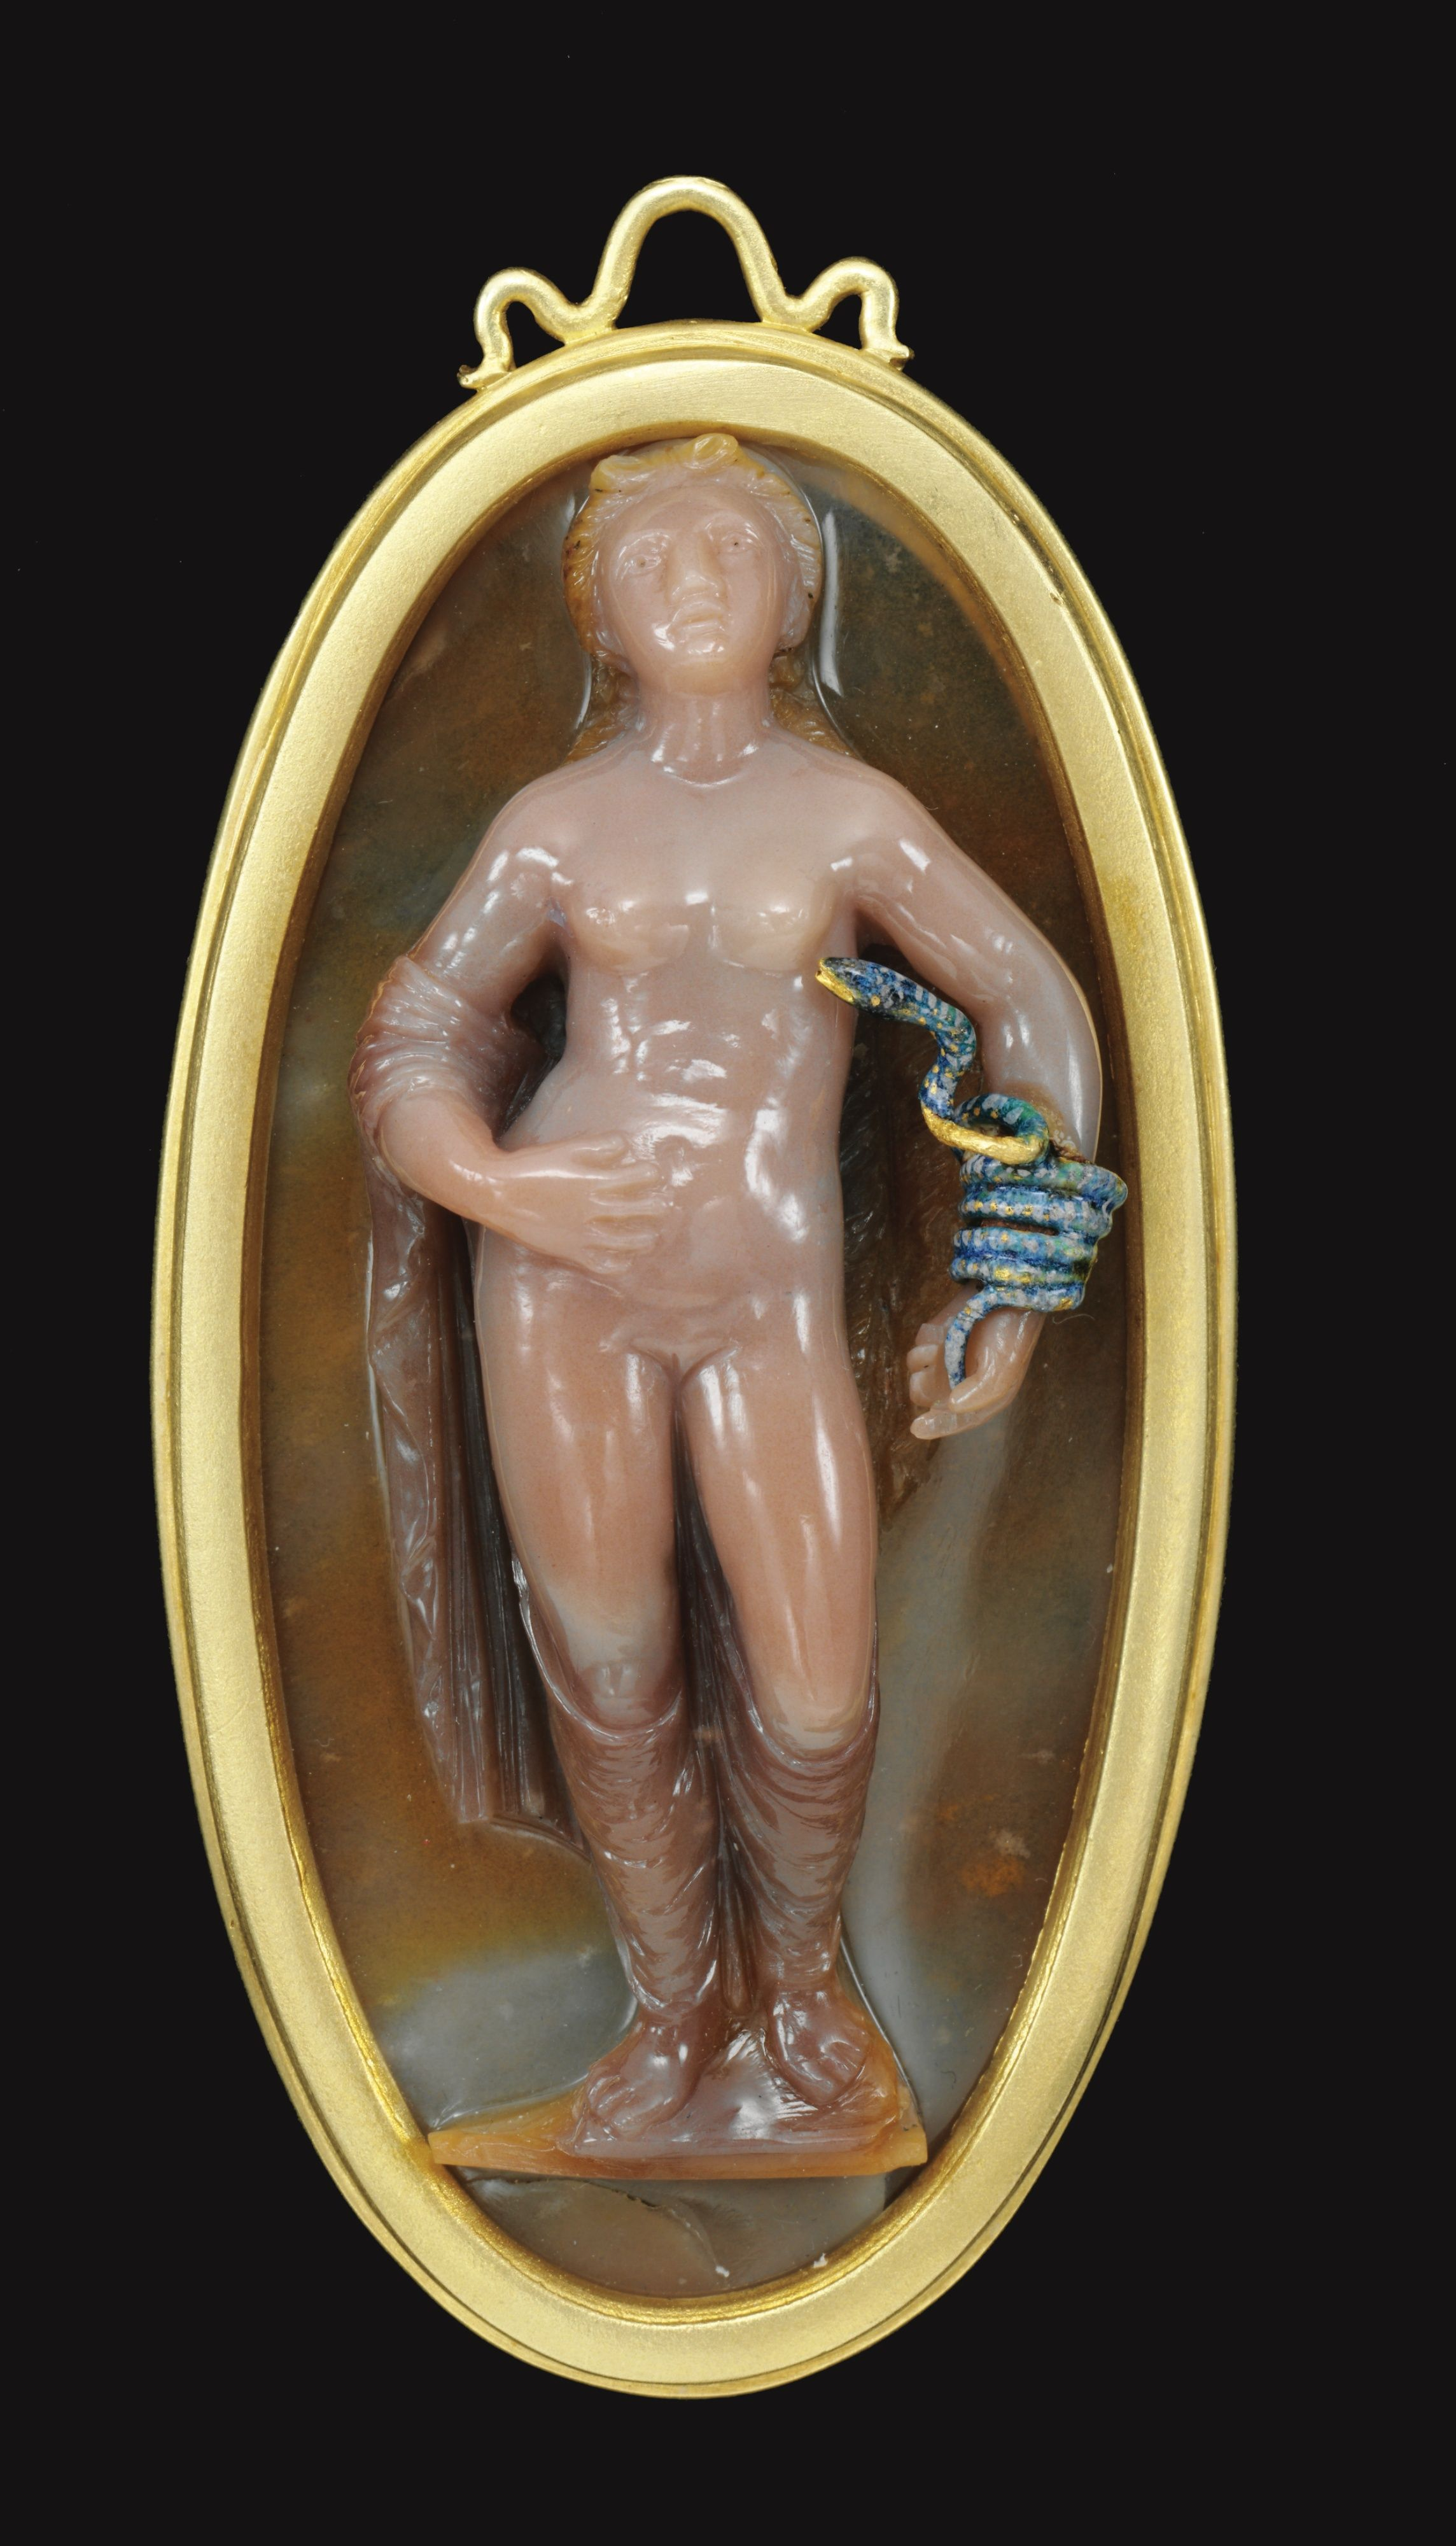 Cameo with cleopatrau attributed to ottavio miseroni